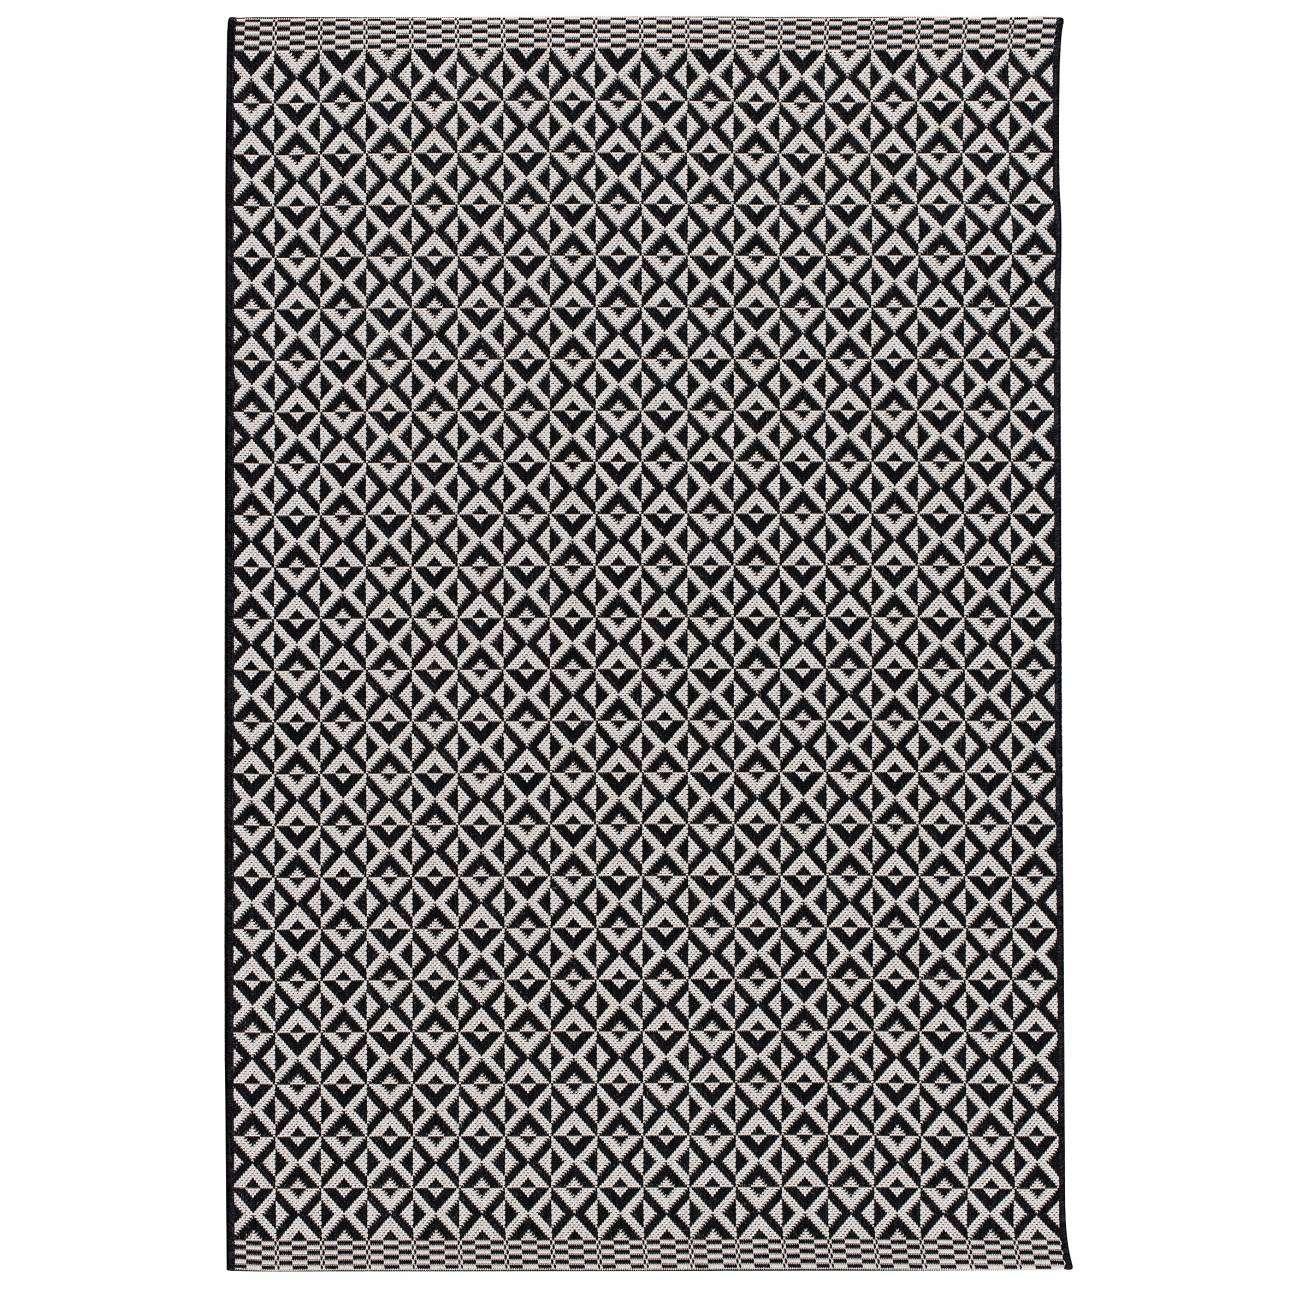 Teppich Modern Geometric black/wool 200x290cm